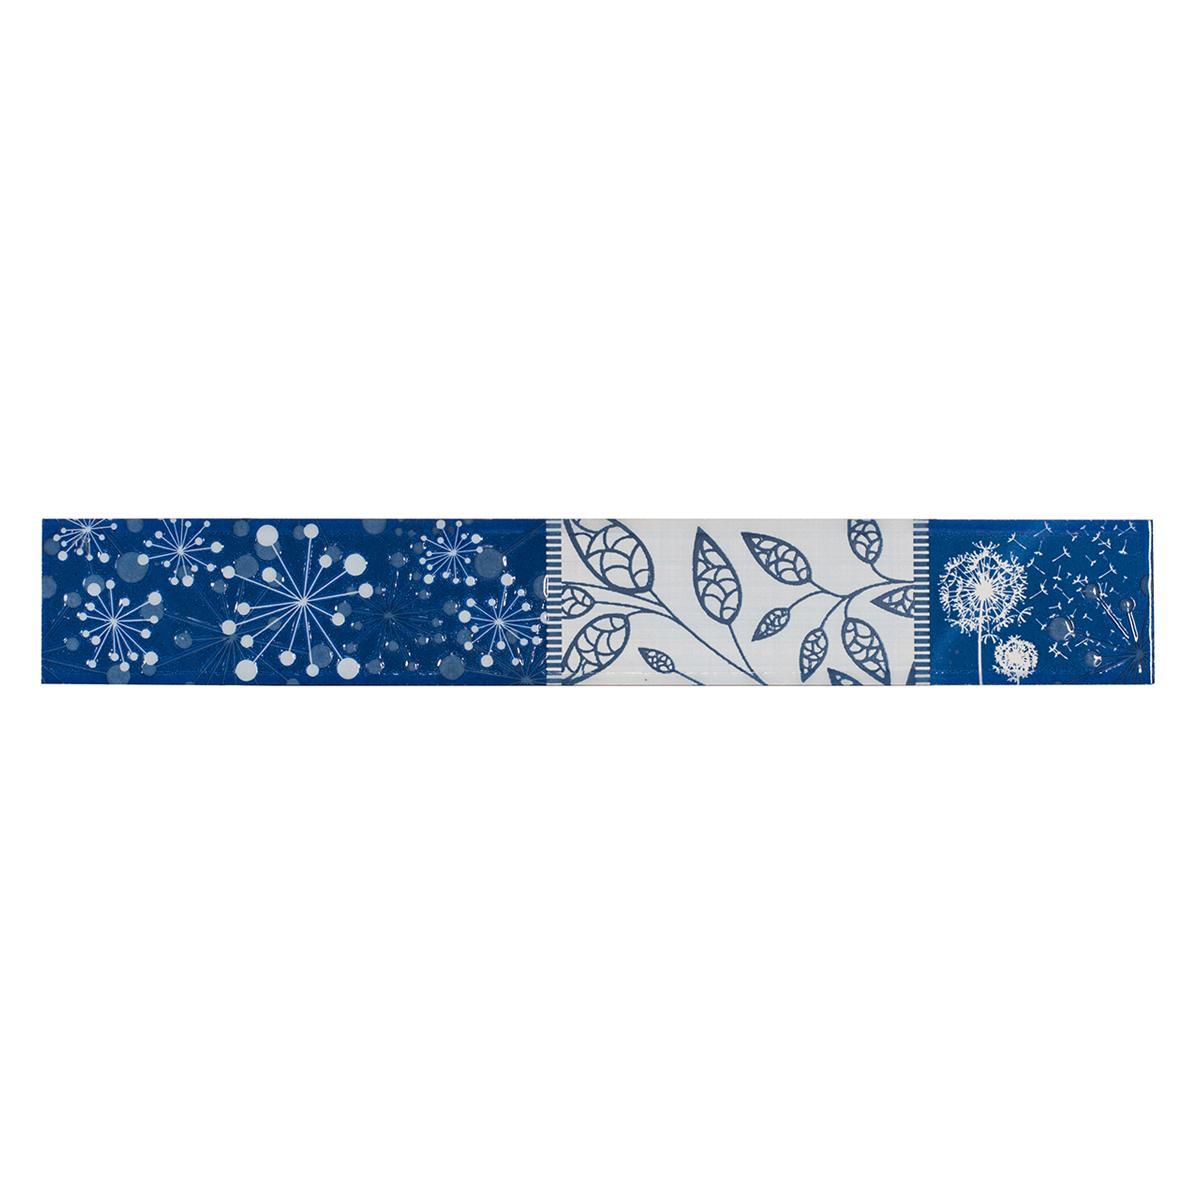 Listelo Decorado Azul Brillante - 6X39.5 cm - 1 pza